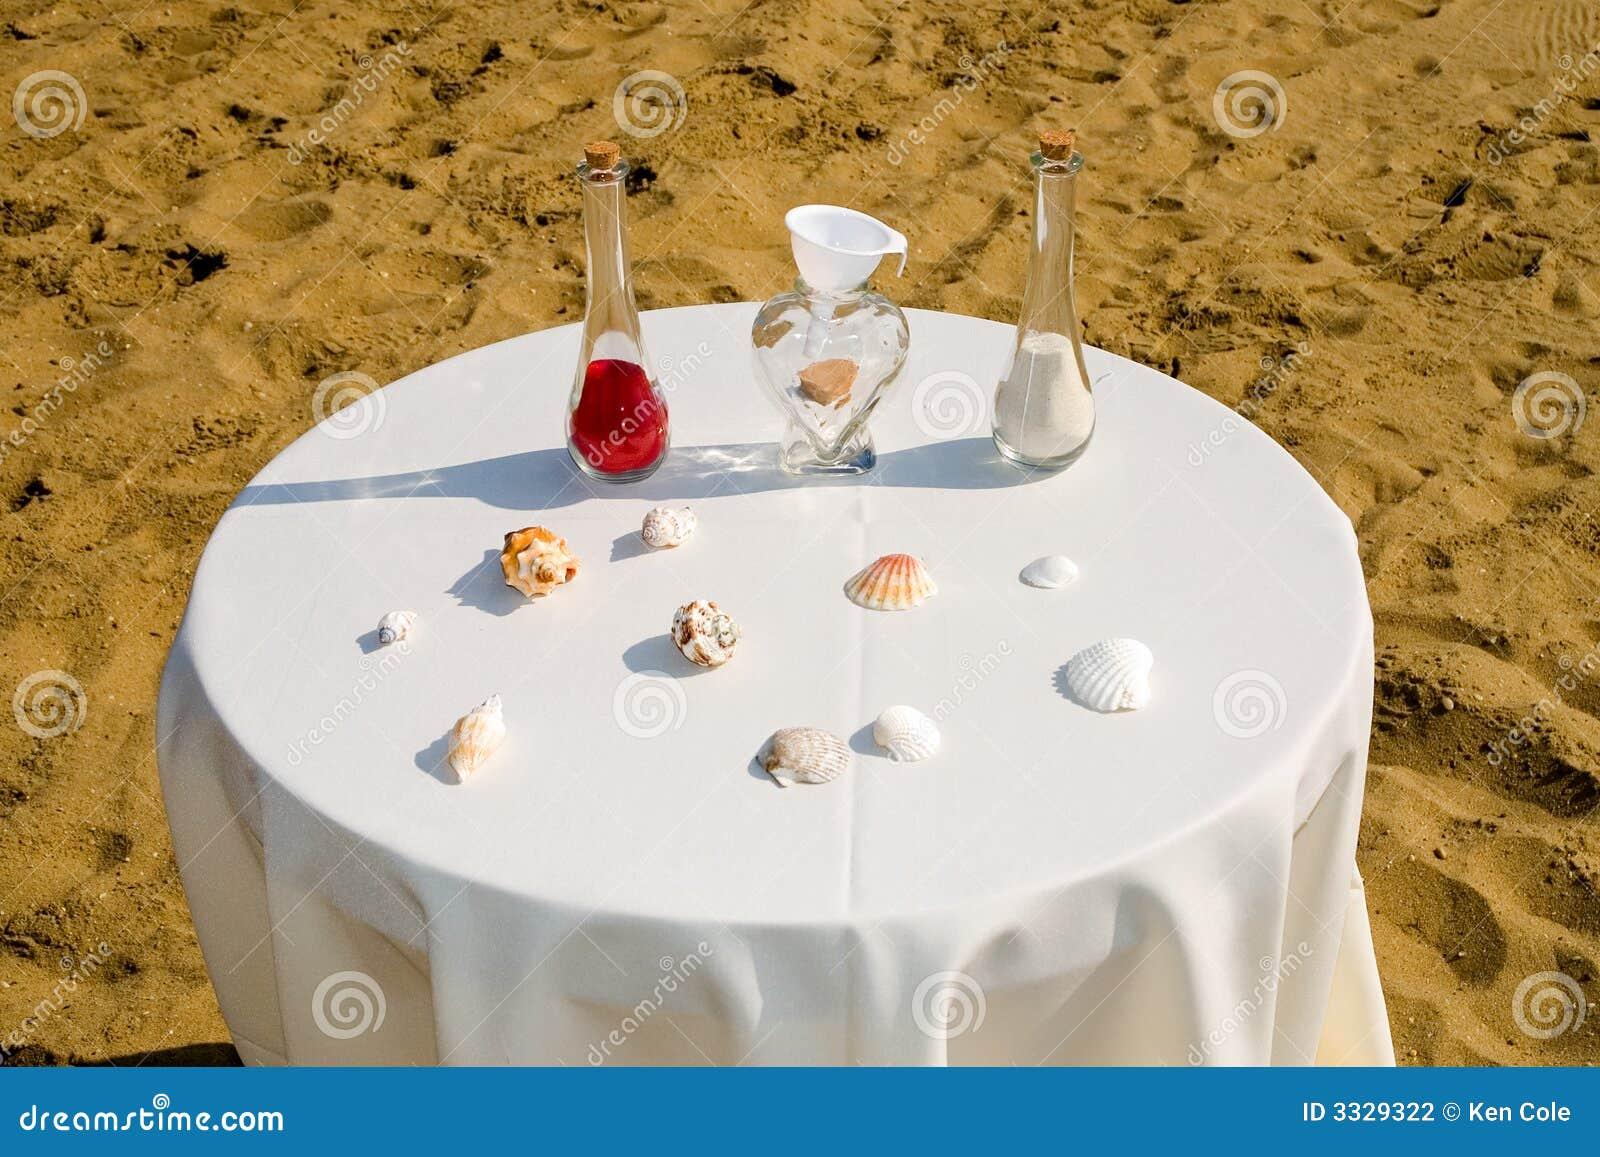 Matrimonio Simbolico De La Arena : Ceremonia de boda la arena fotografía archivo